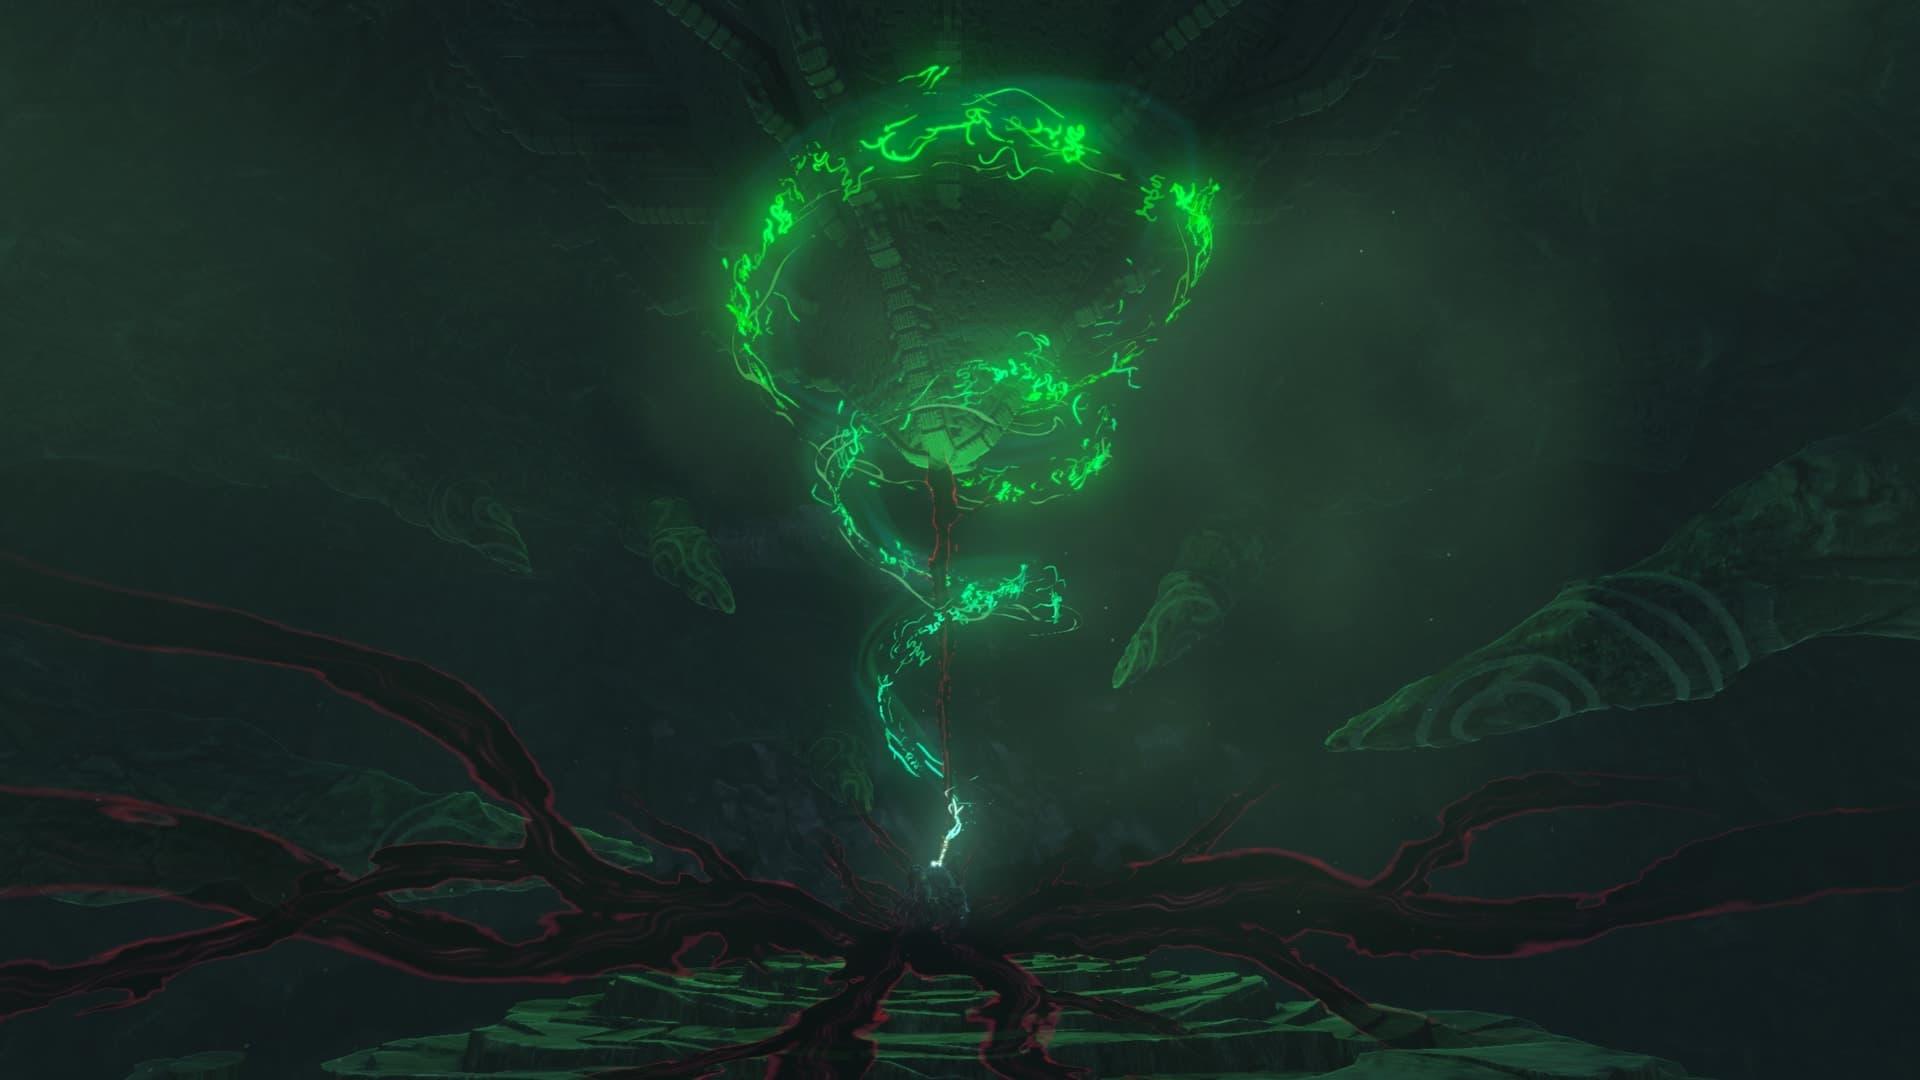 The Legend of Zelda: Breath of the Wild Sequel E3 2019 Screenshot 3